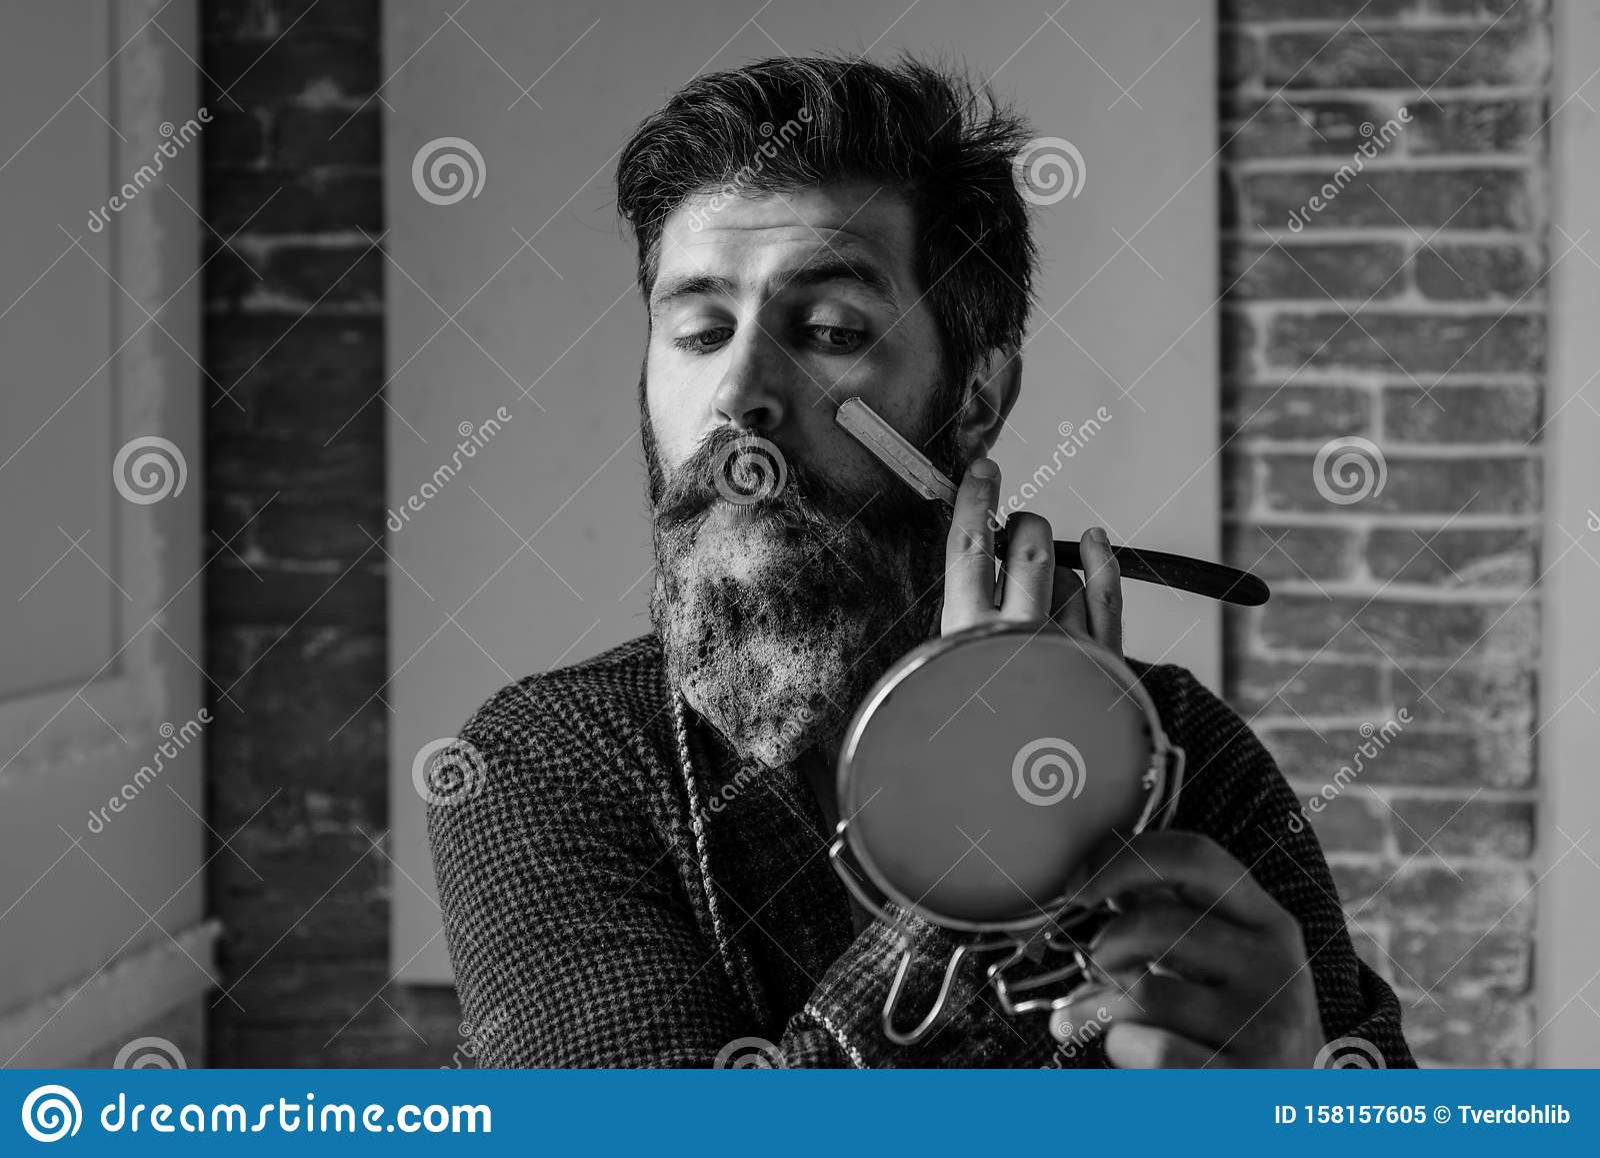 Bearded man - home beard style. Portrait of stylish man beard. Barber straight razor, barbershop. Vintage barber shop